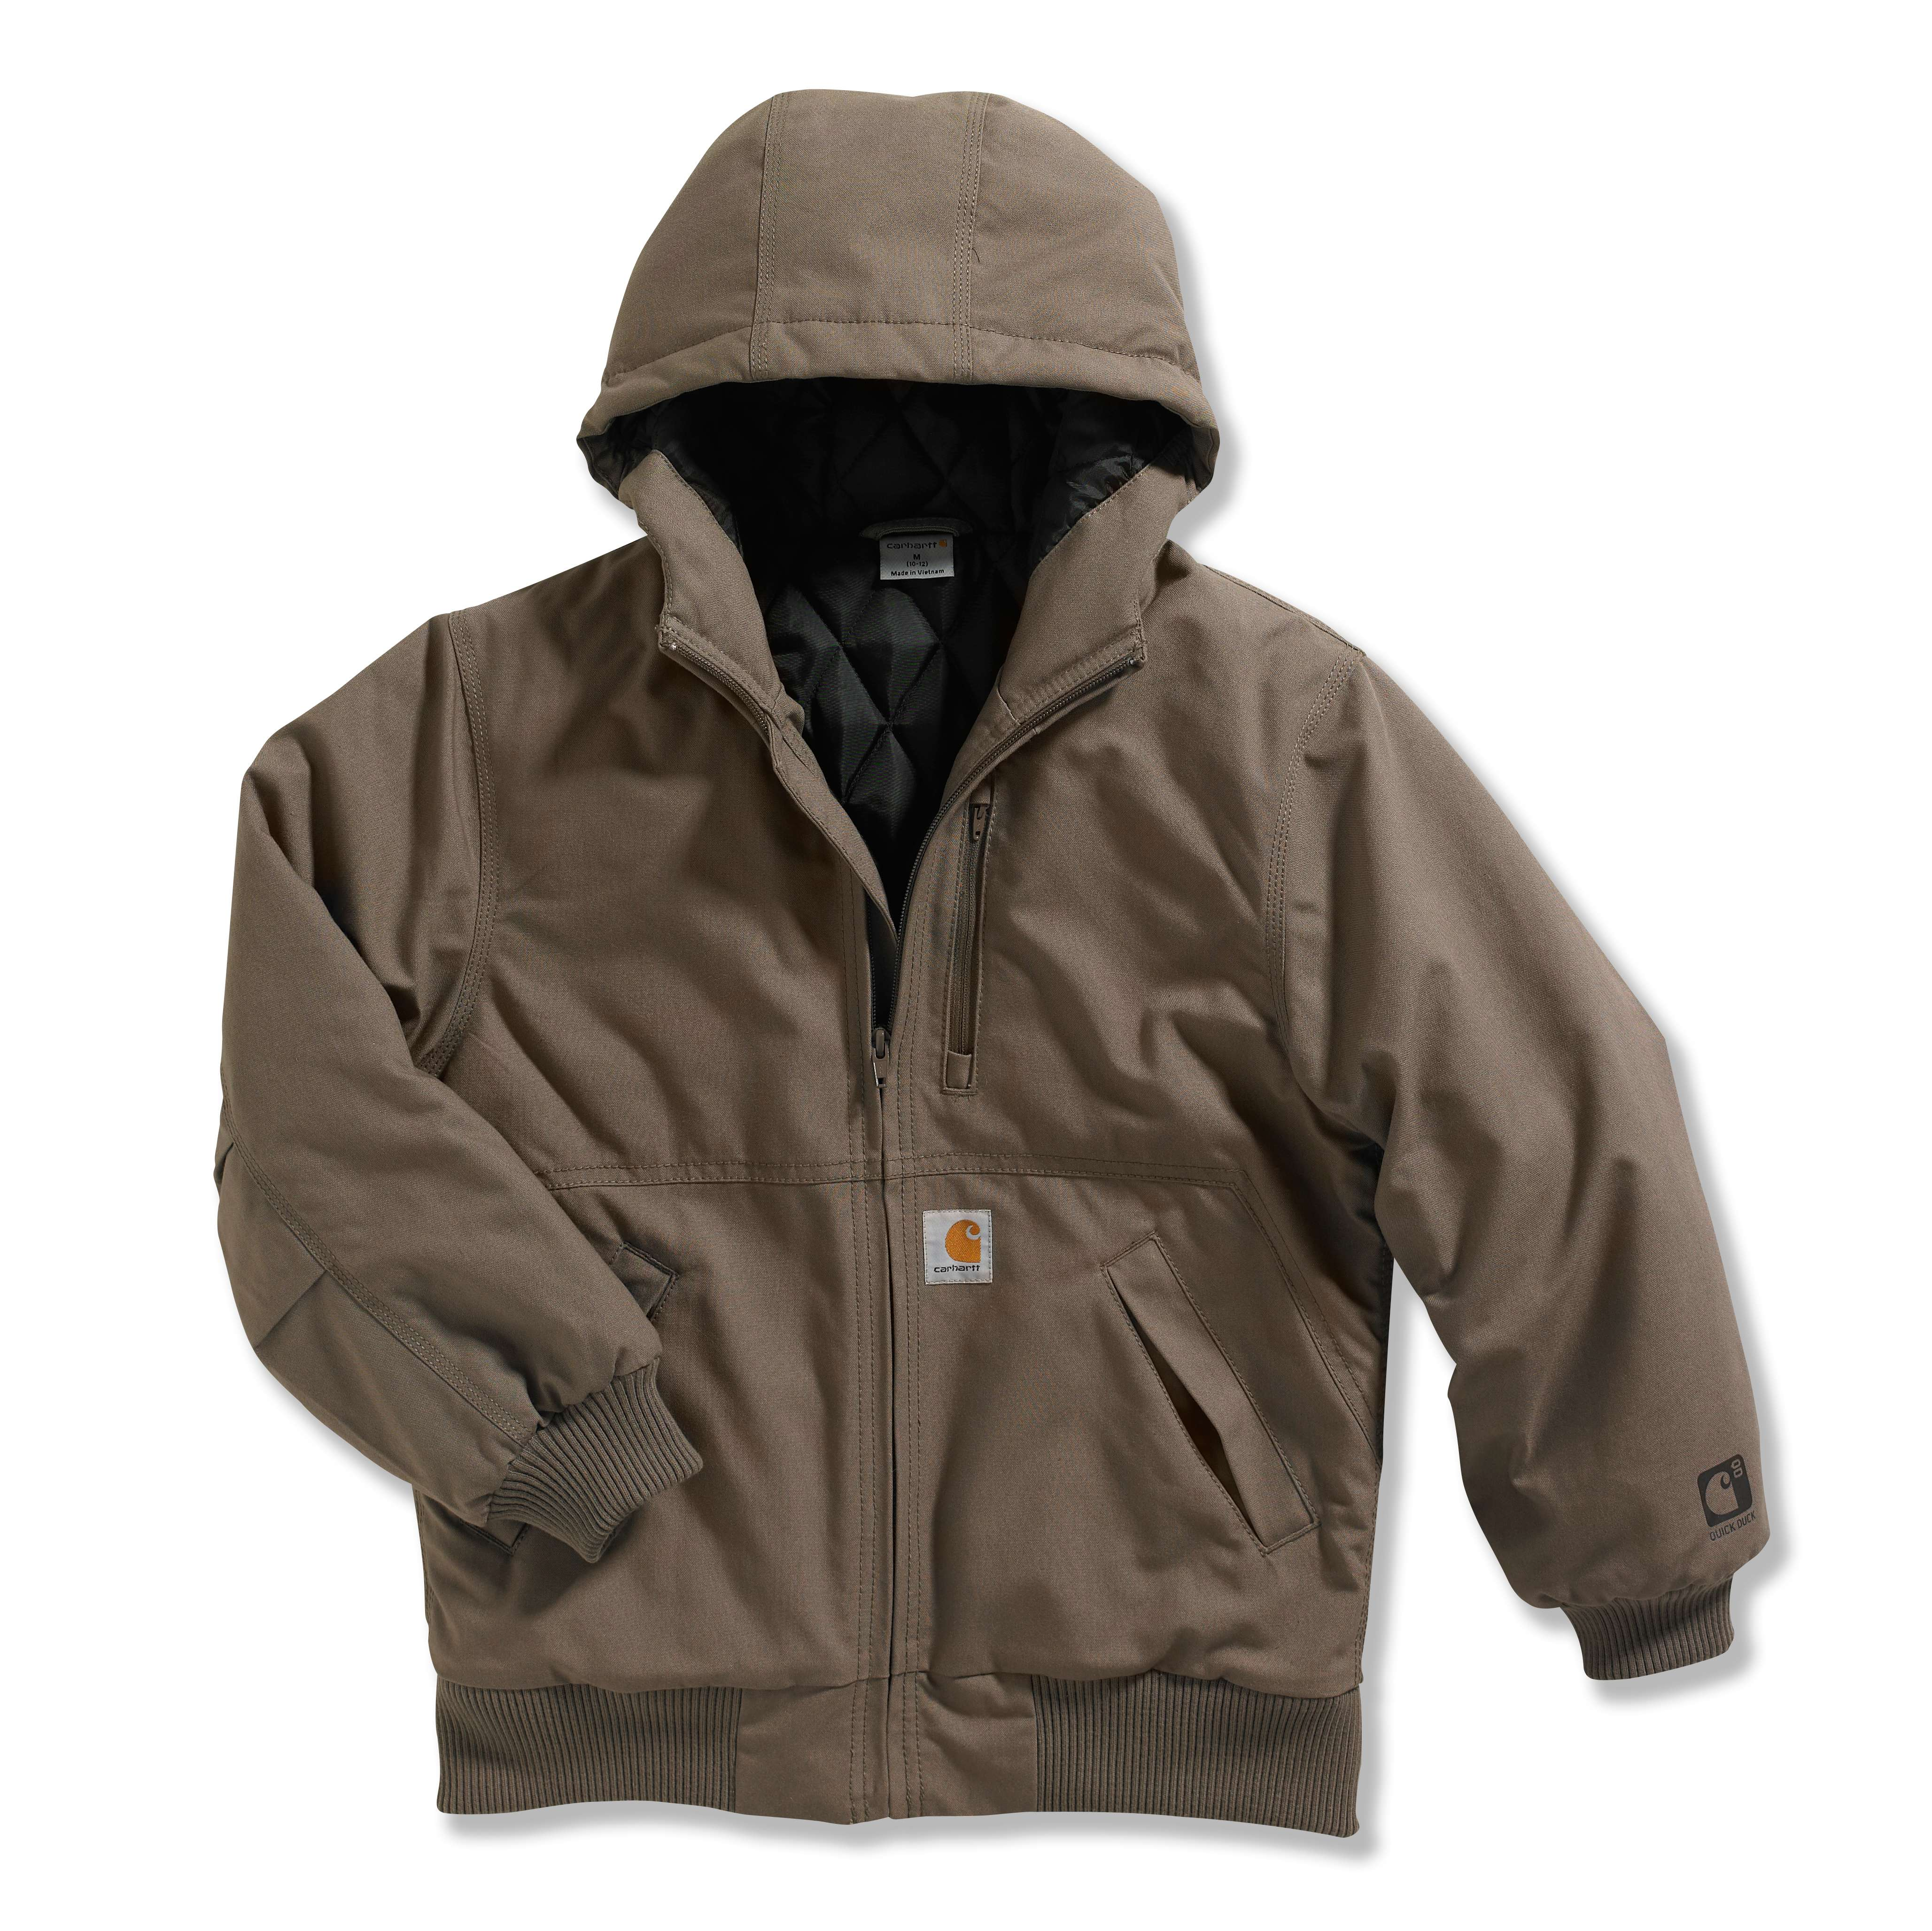 Carhartt Quick Duck Jacket